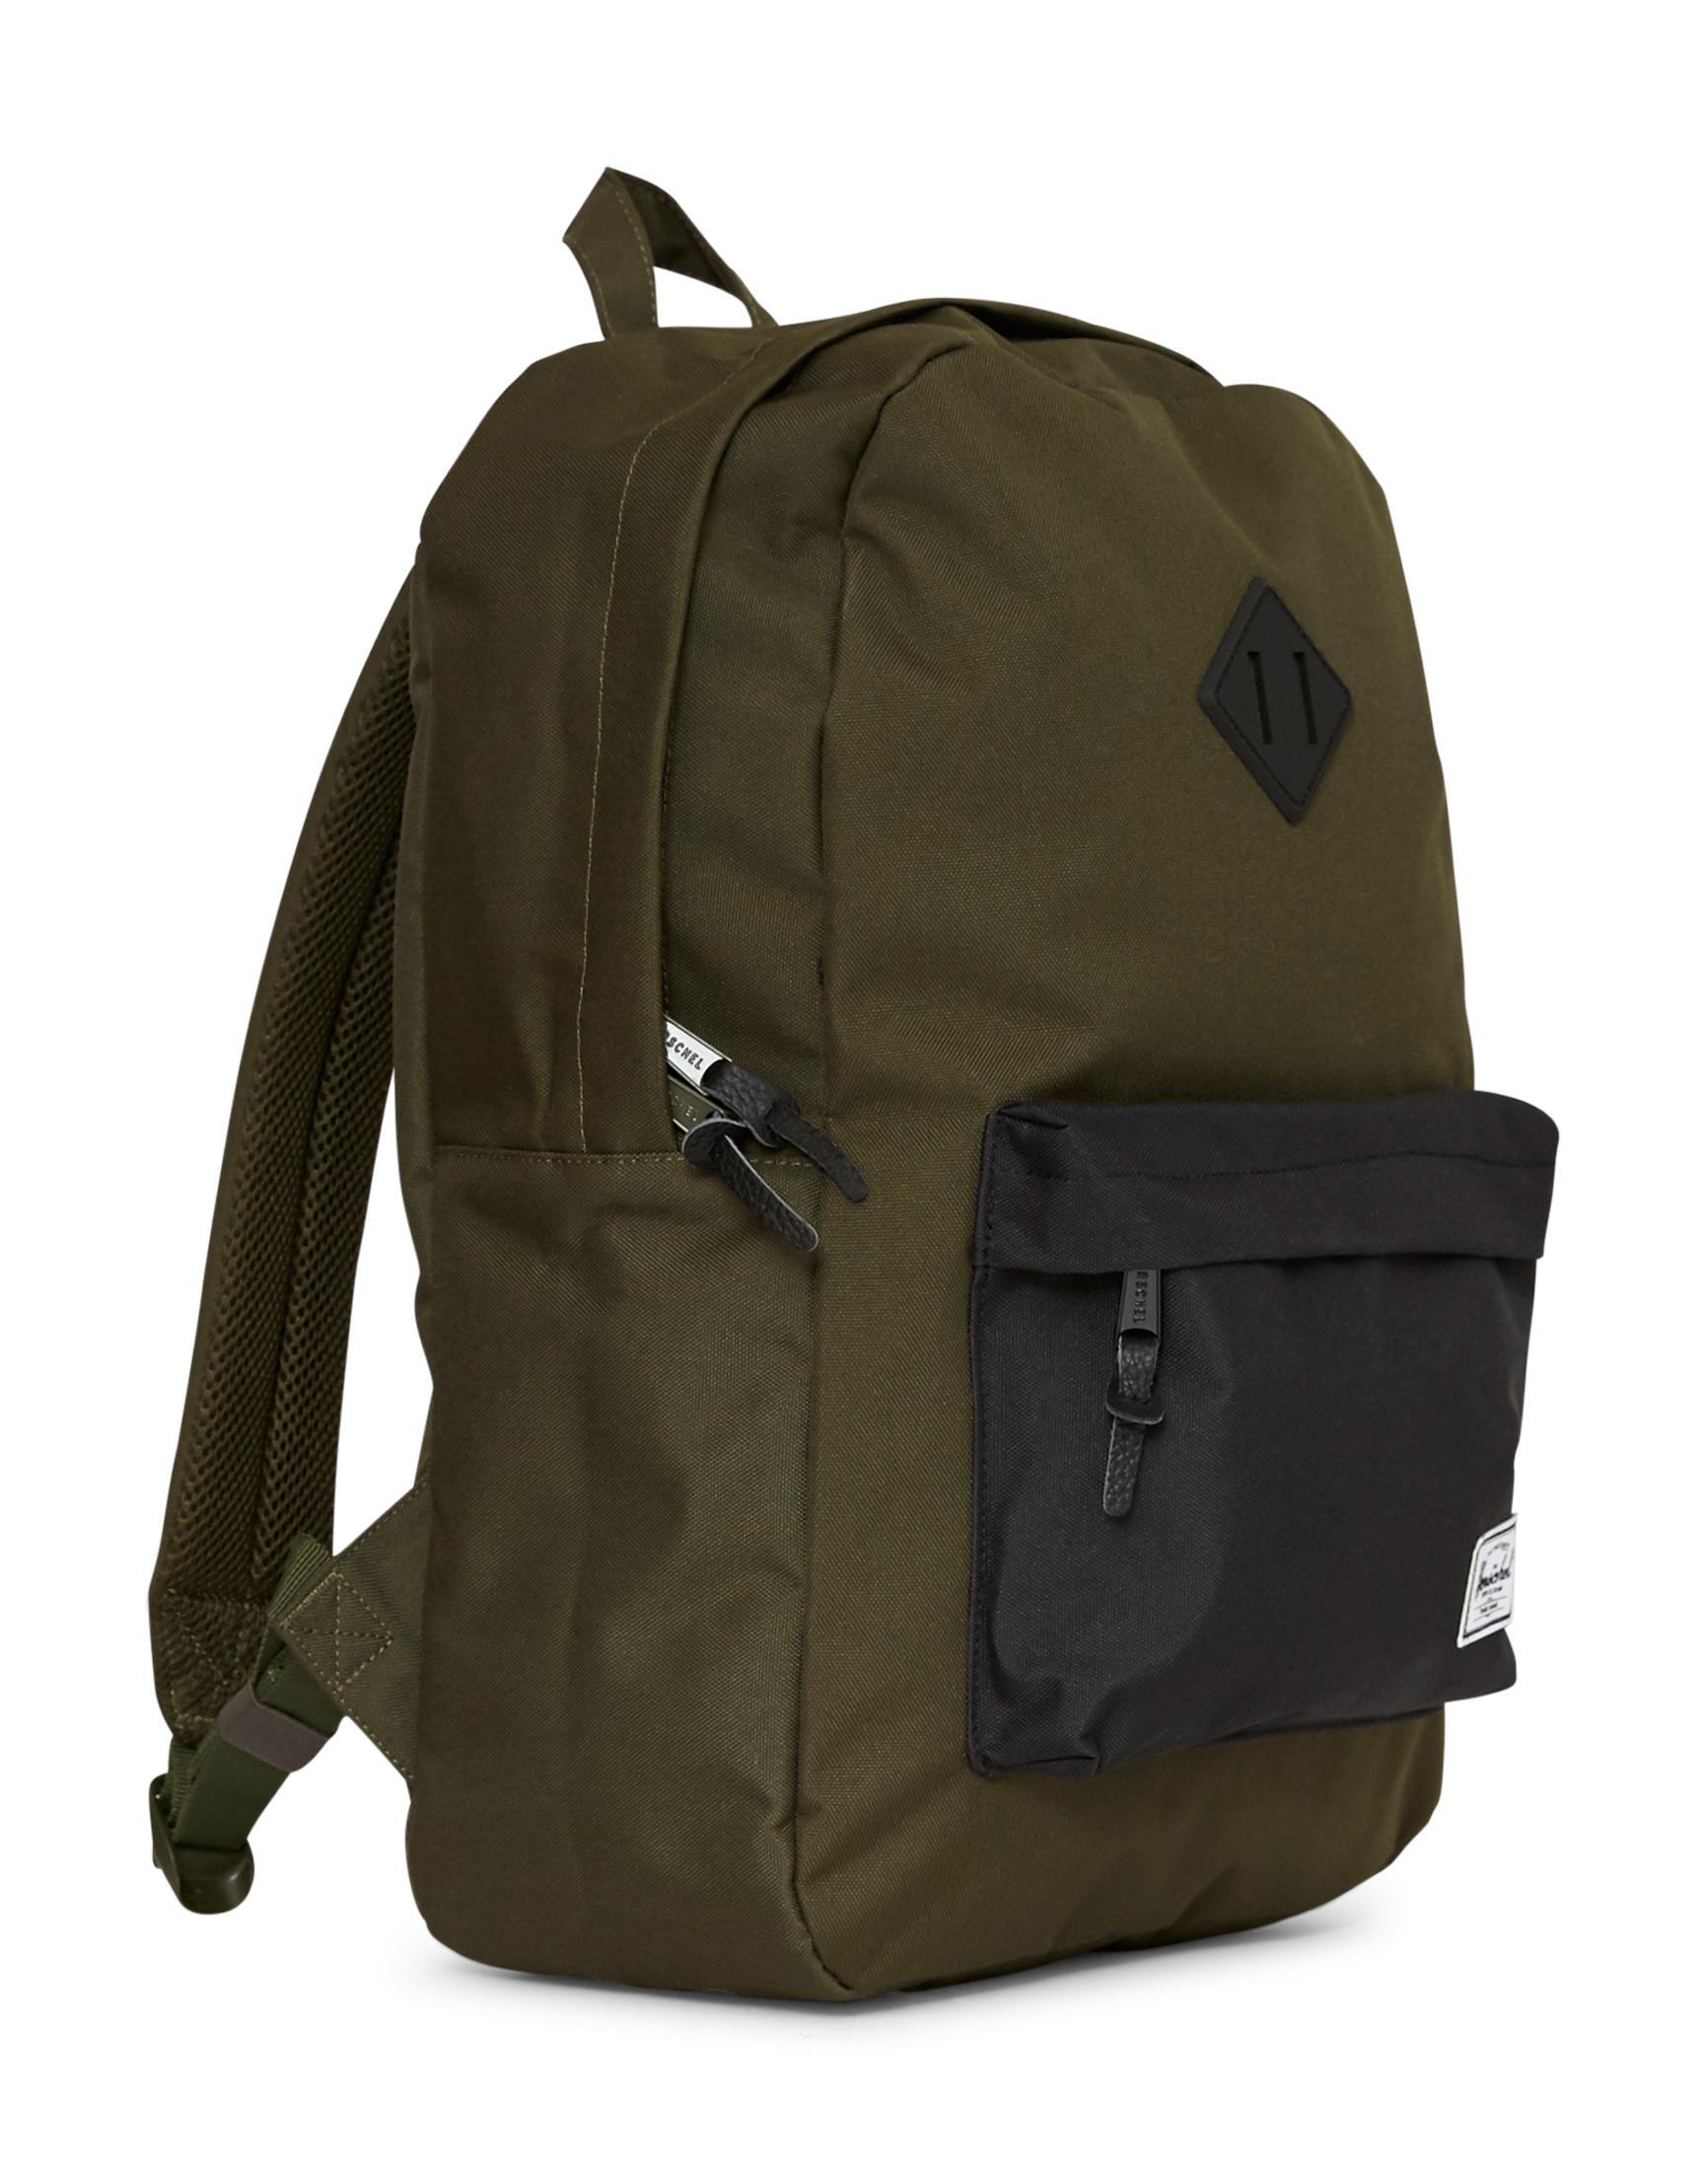 a8fe8ccf86 Herschel Supply Co. Heritage Duffle Bag Green   Navy in Blue for Men ...